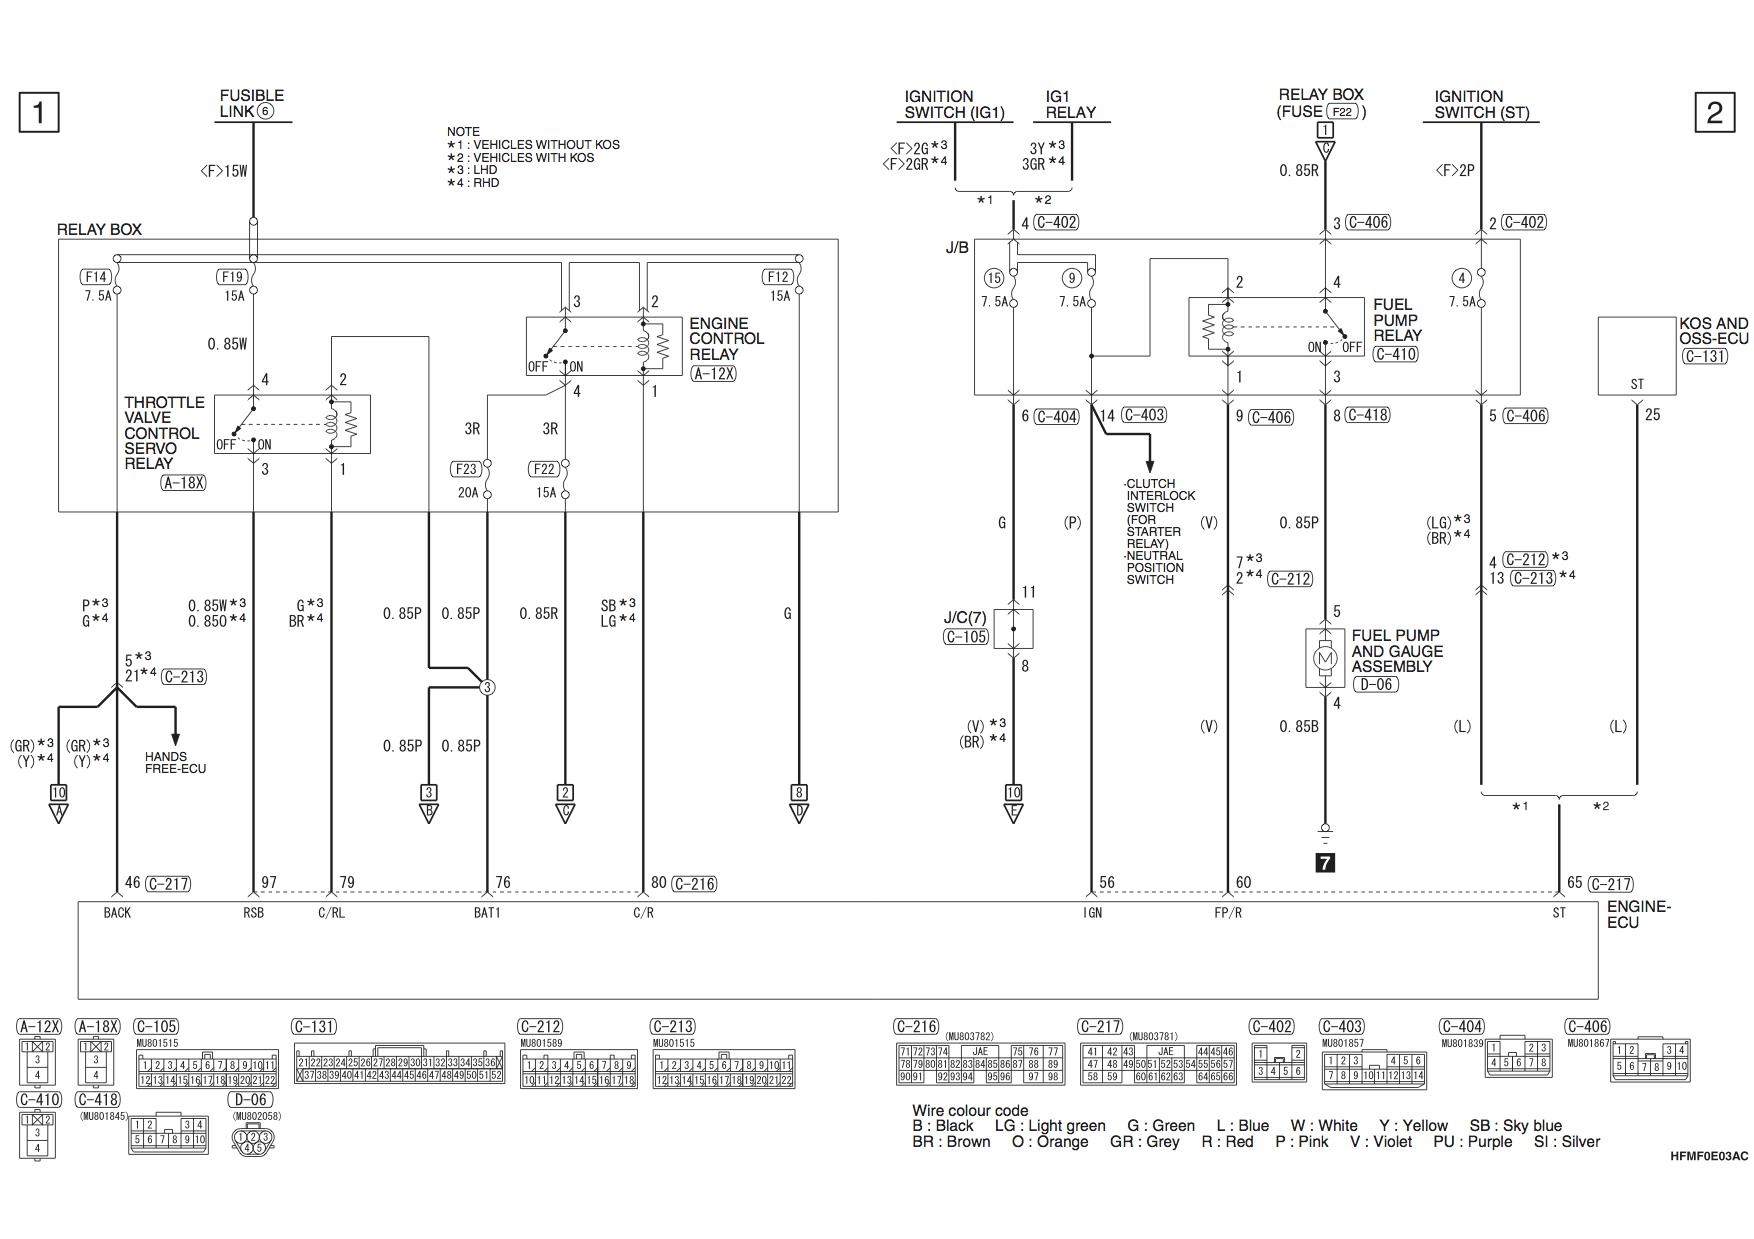 Mitsubishi Mirage 2 12 petrol circuit diagrams \u2014 Car Mechanics